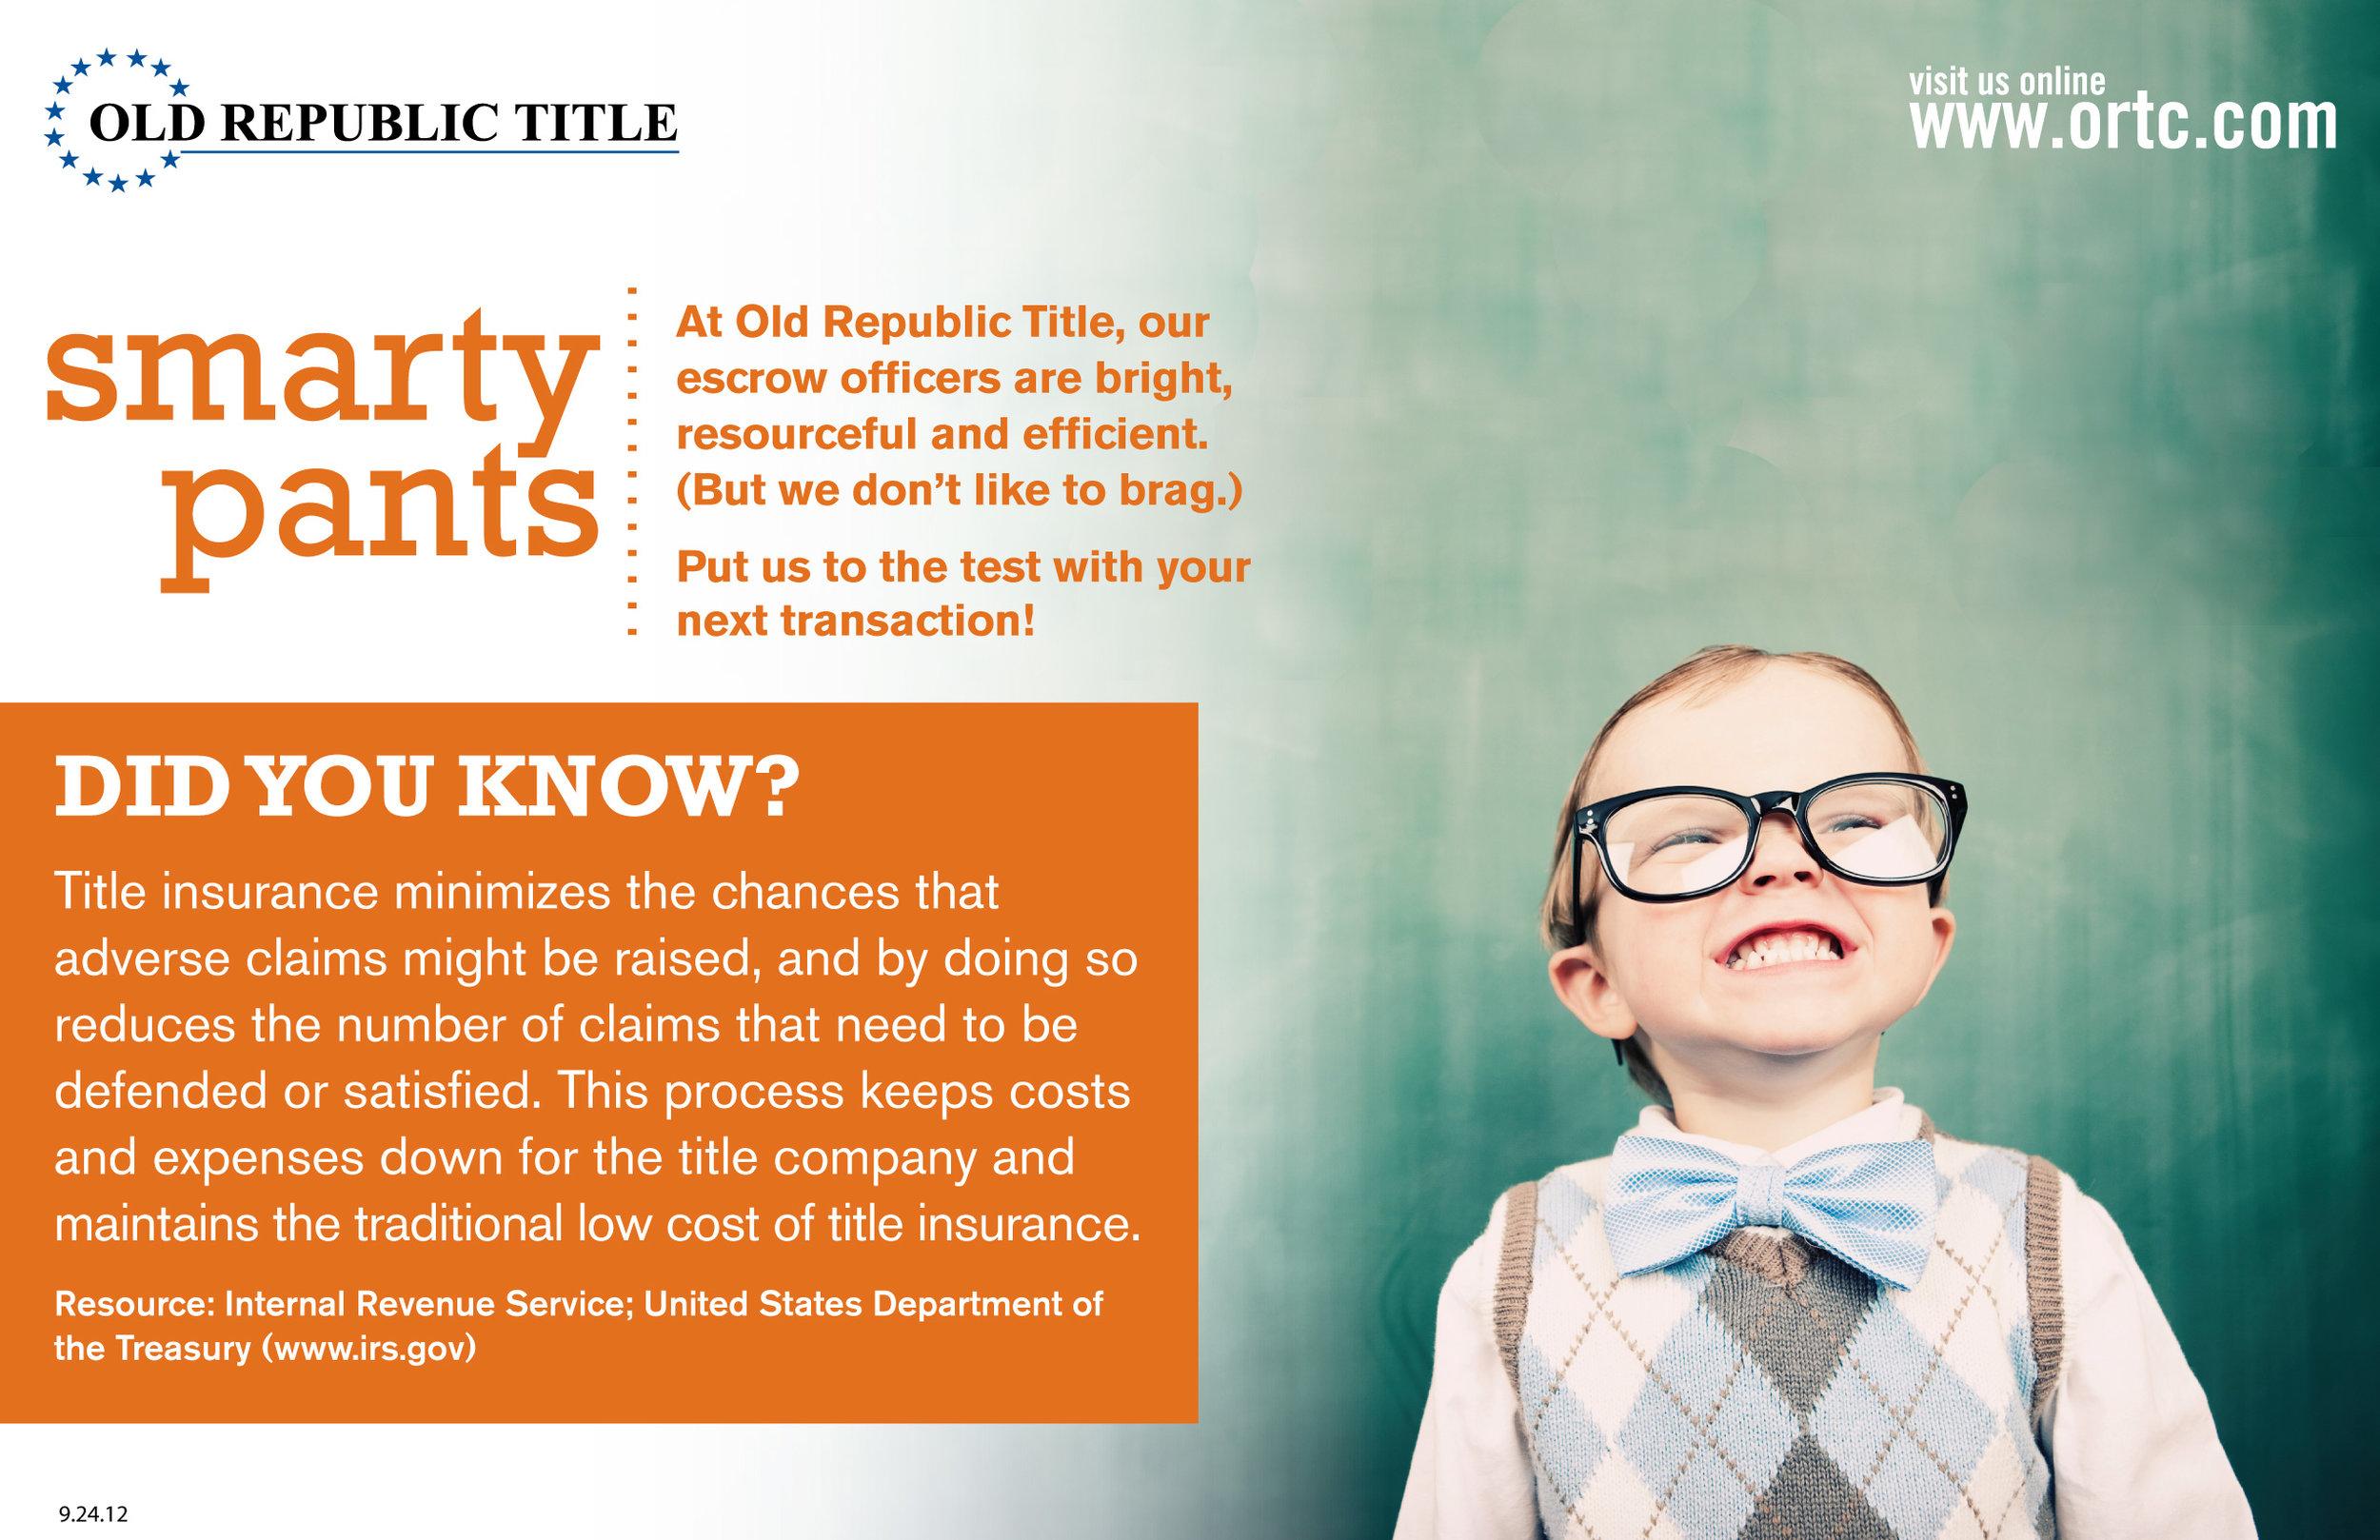 kids_campaign_smarty_pants_HR-03.jpg